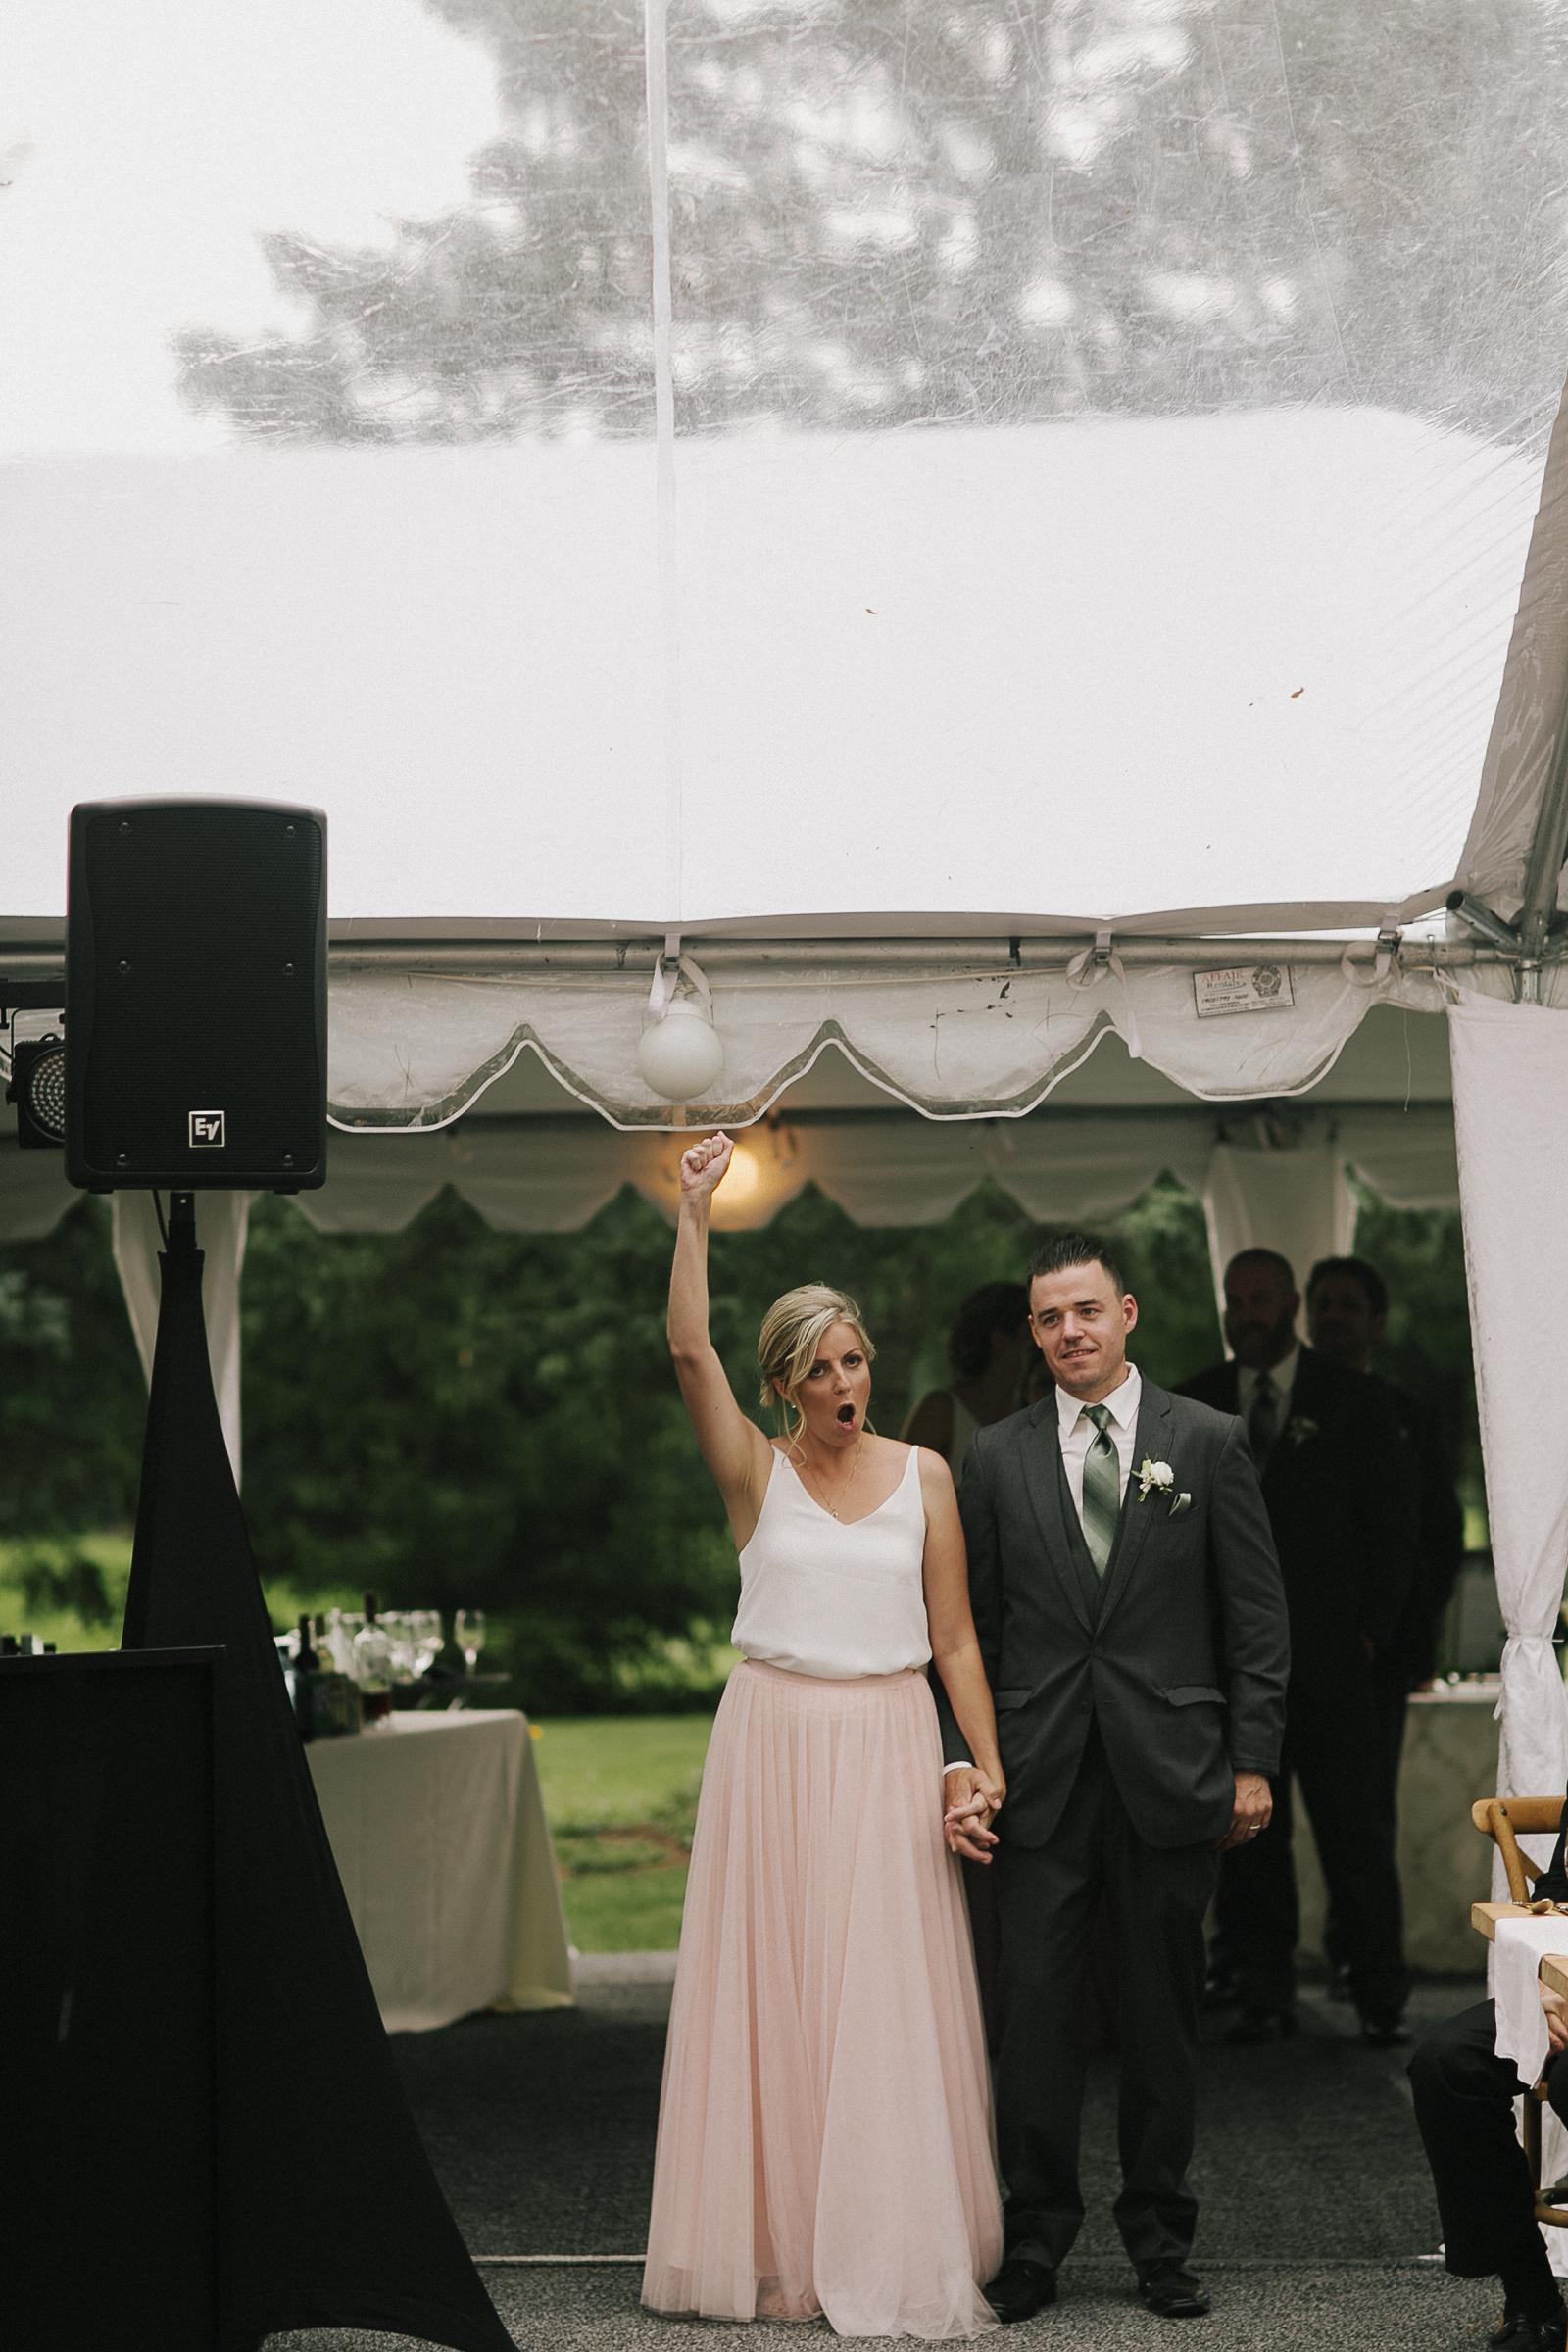 mike-and-jenni-wedding-403.jpg